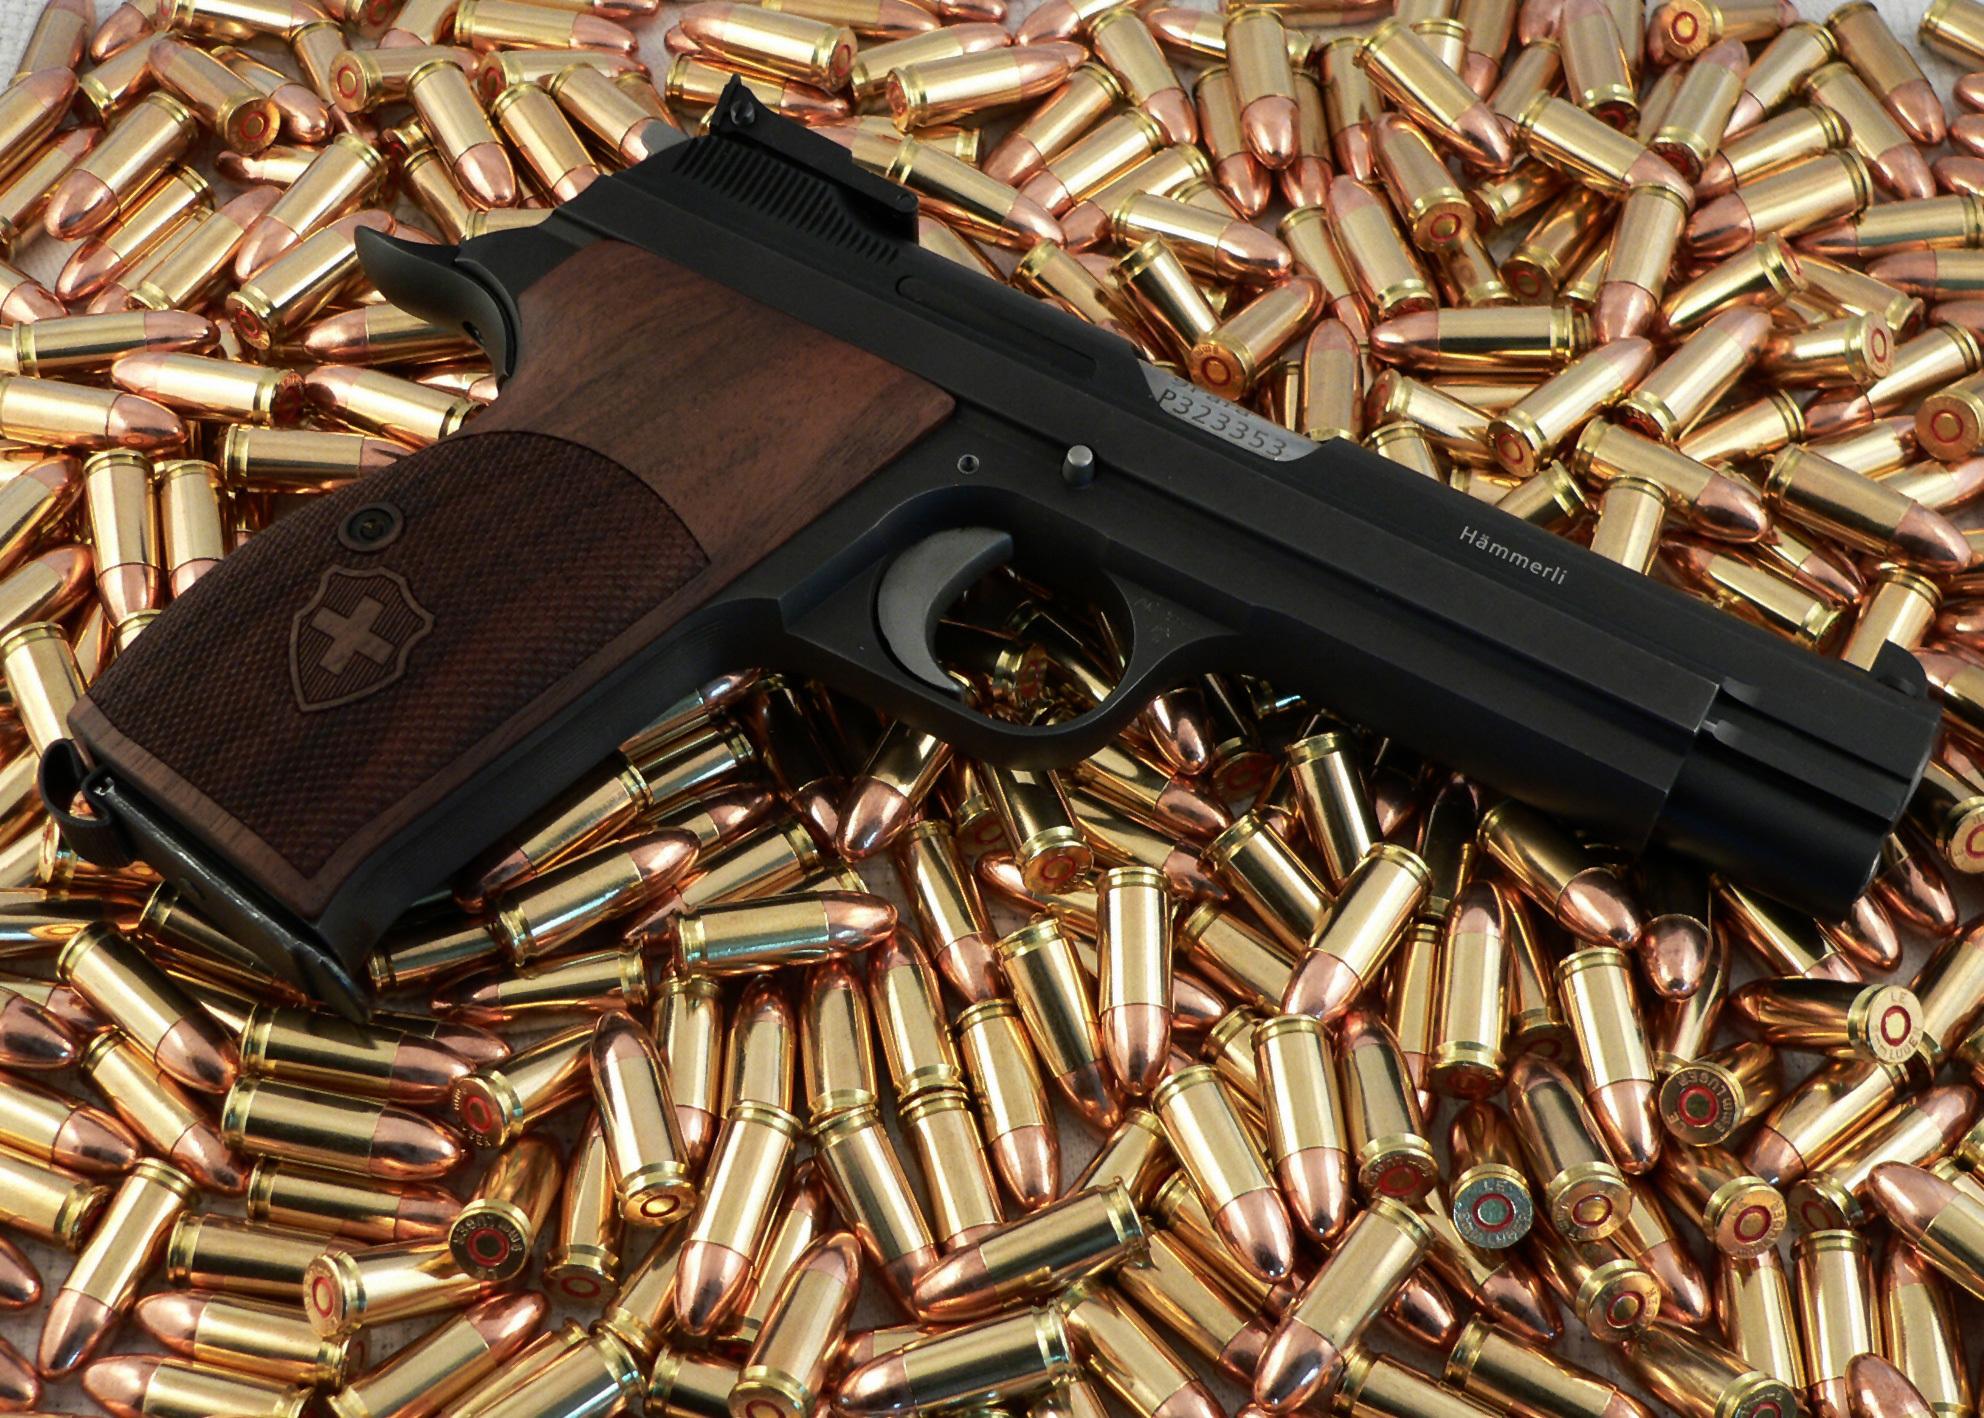 Картинки много пистолетов